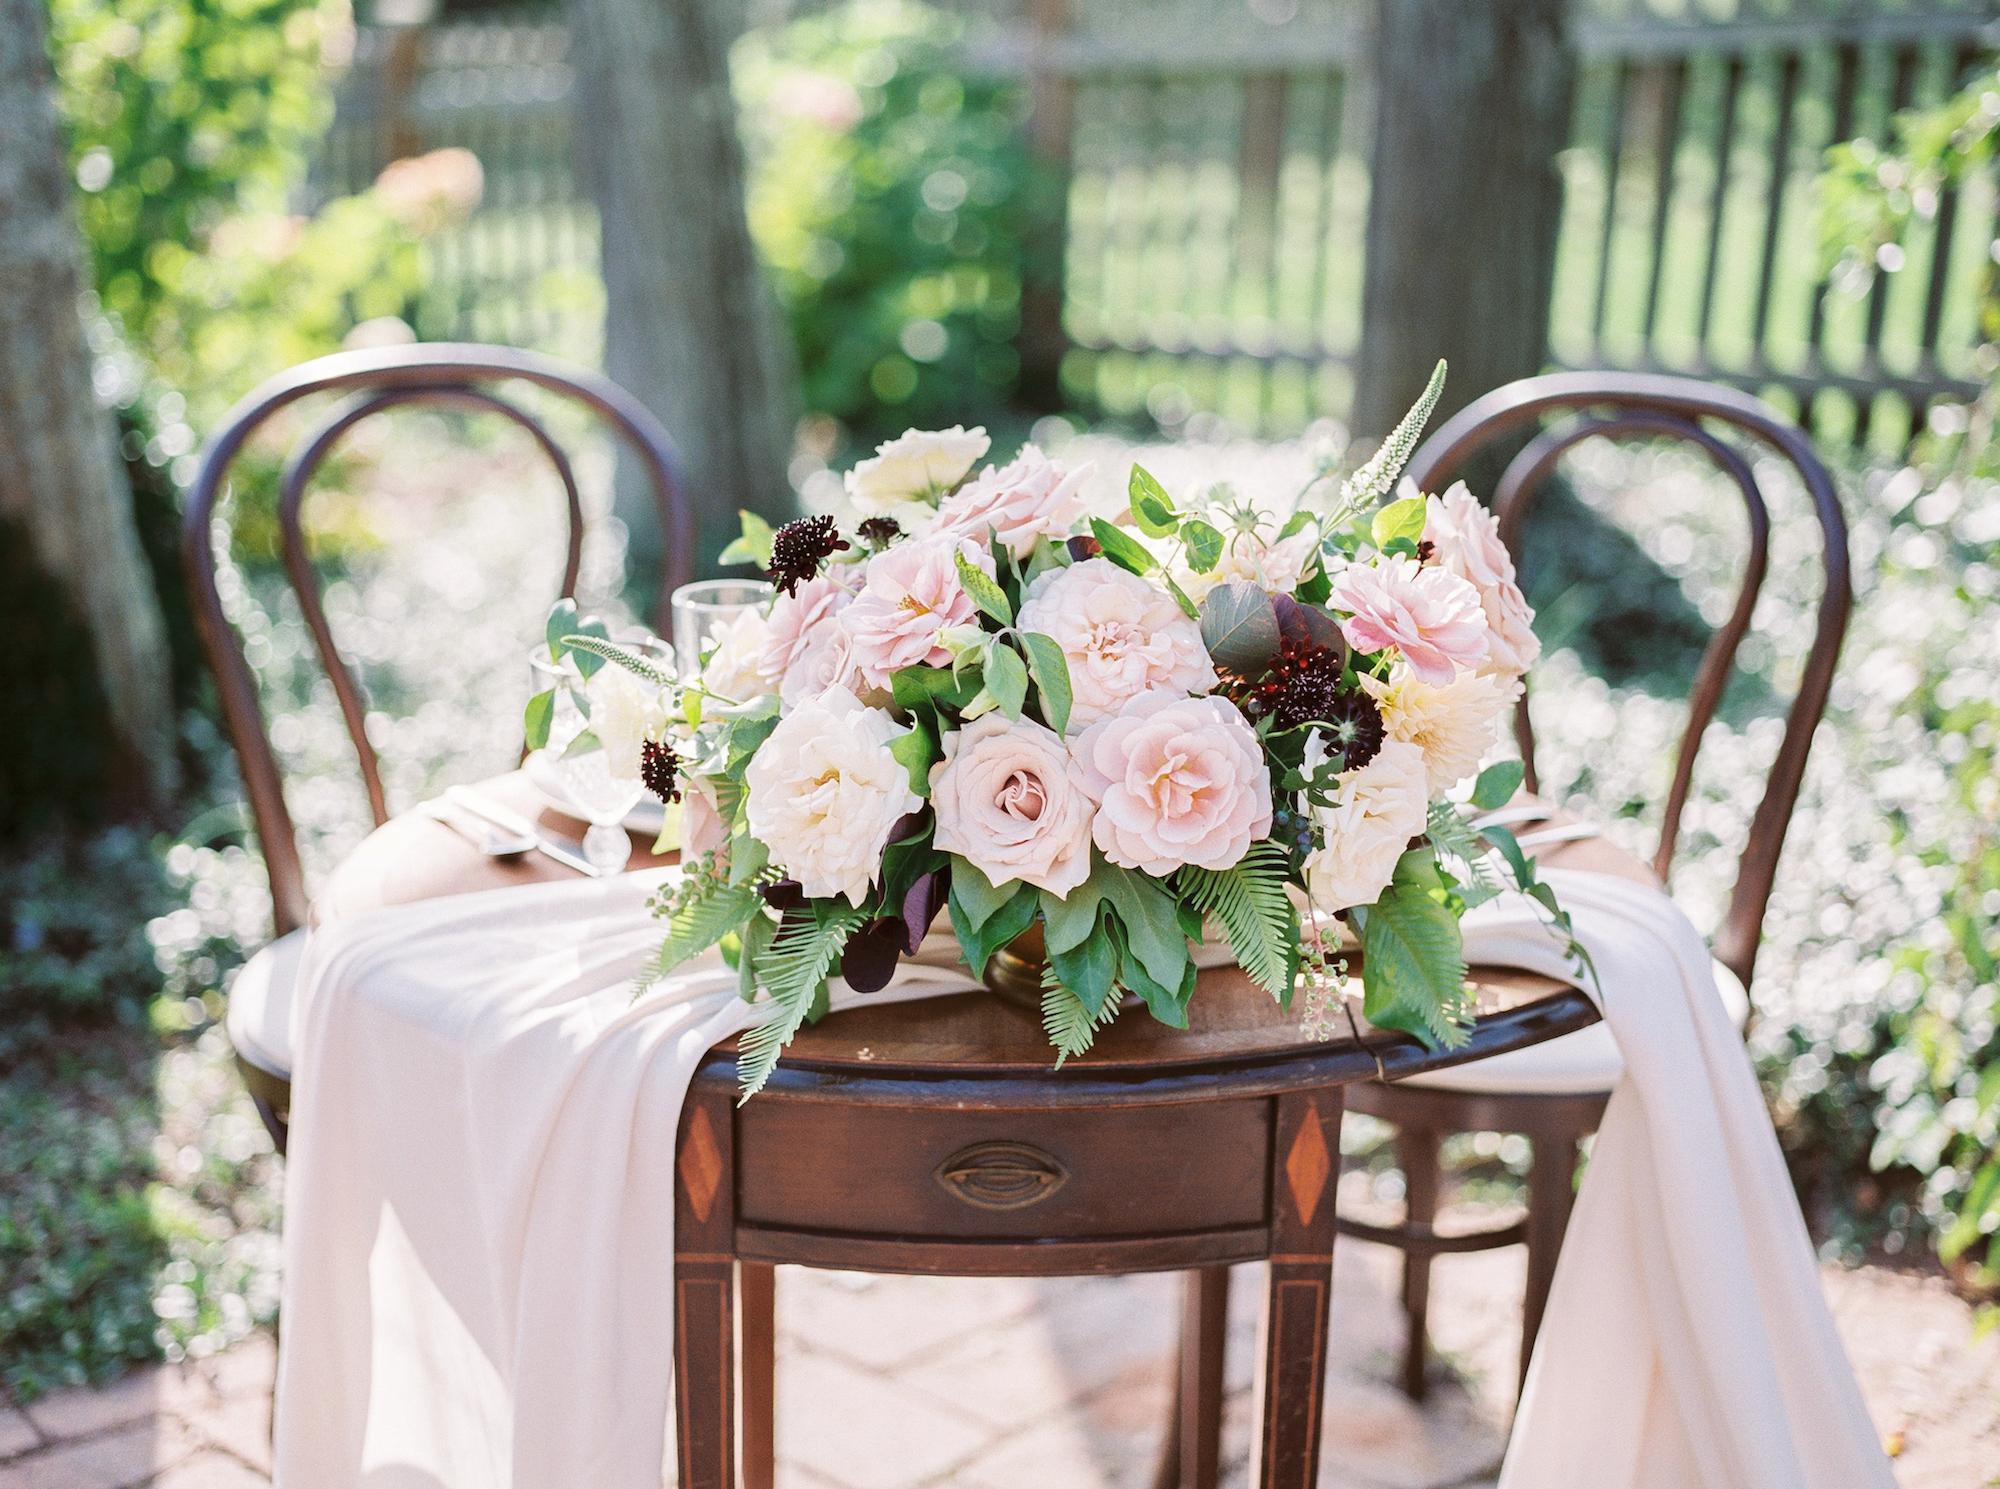 Boutique-DC-MD-VA-Event-Planner-Wedding-Designer-A-Griffin-Events-Fall-Elopement54.jpg